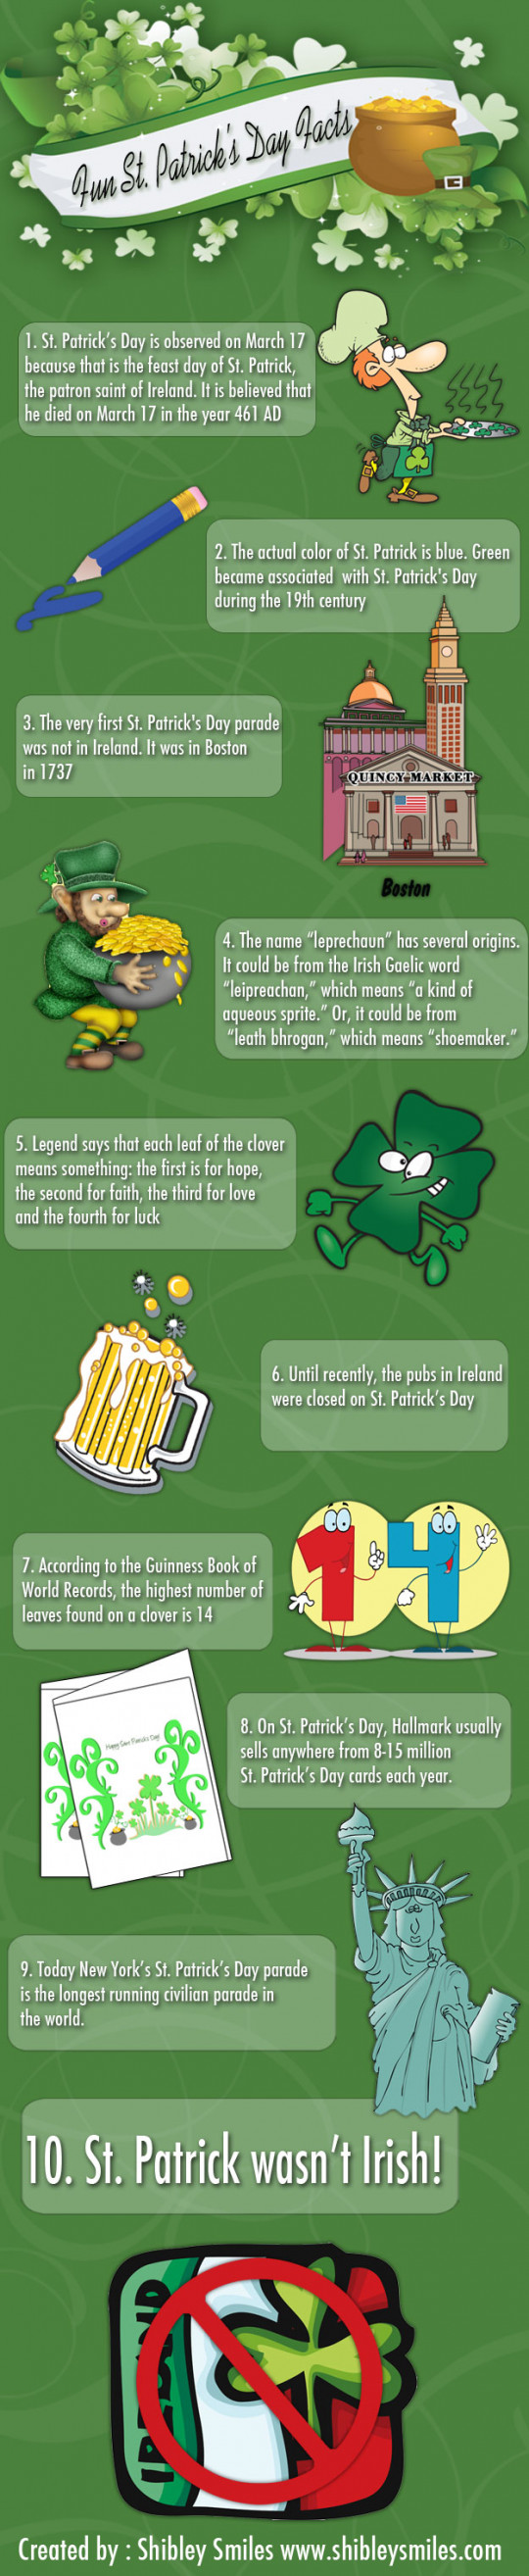 Fun St. Patrick